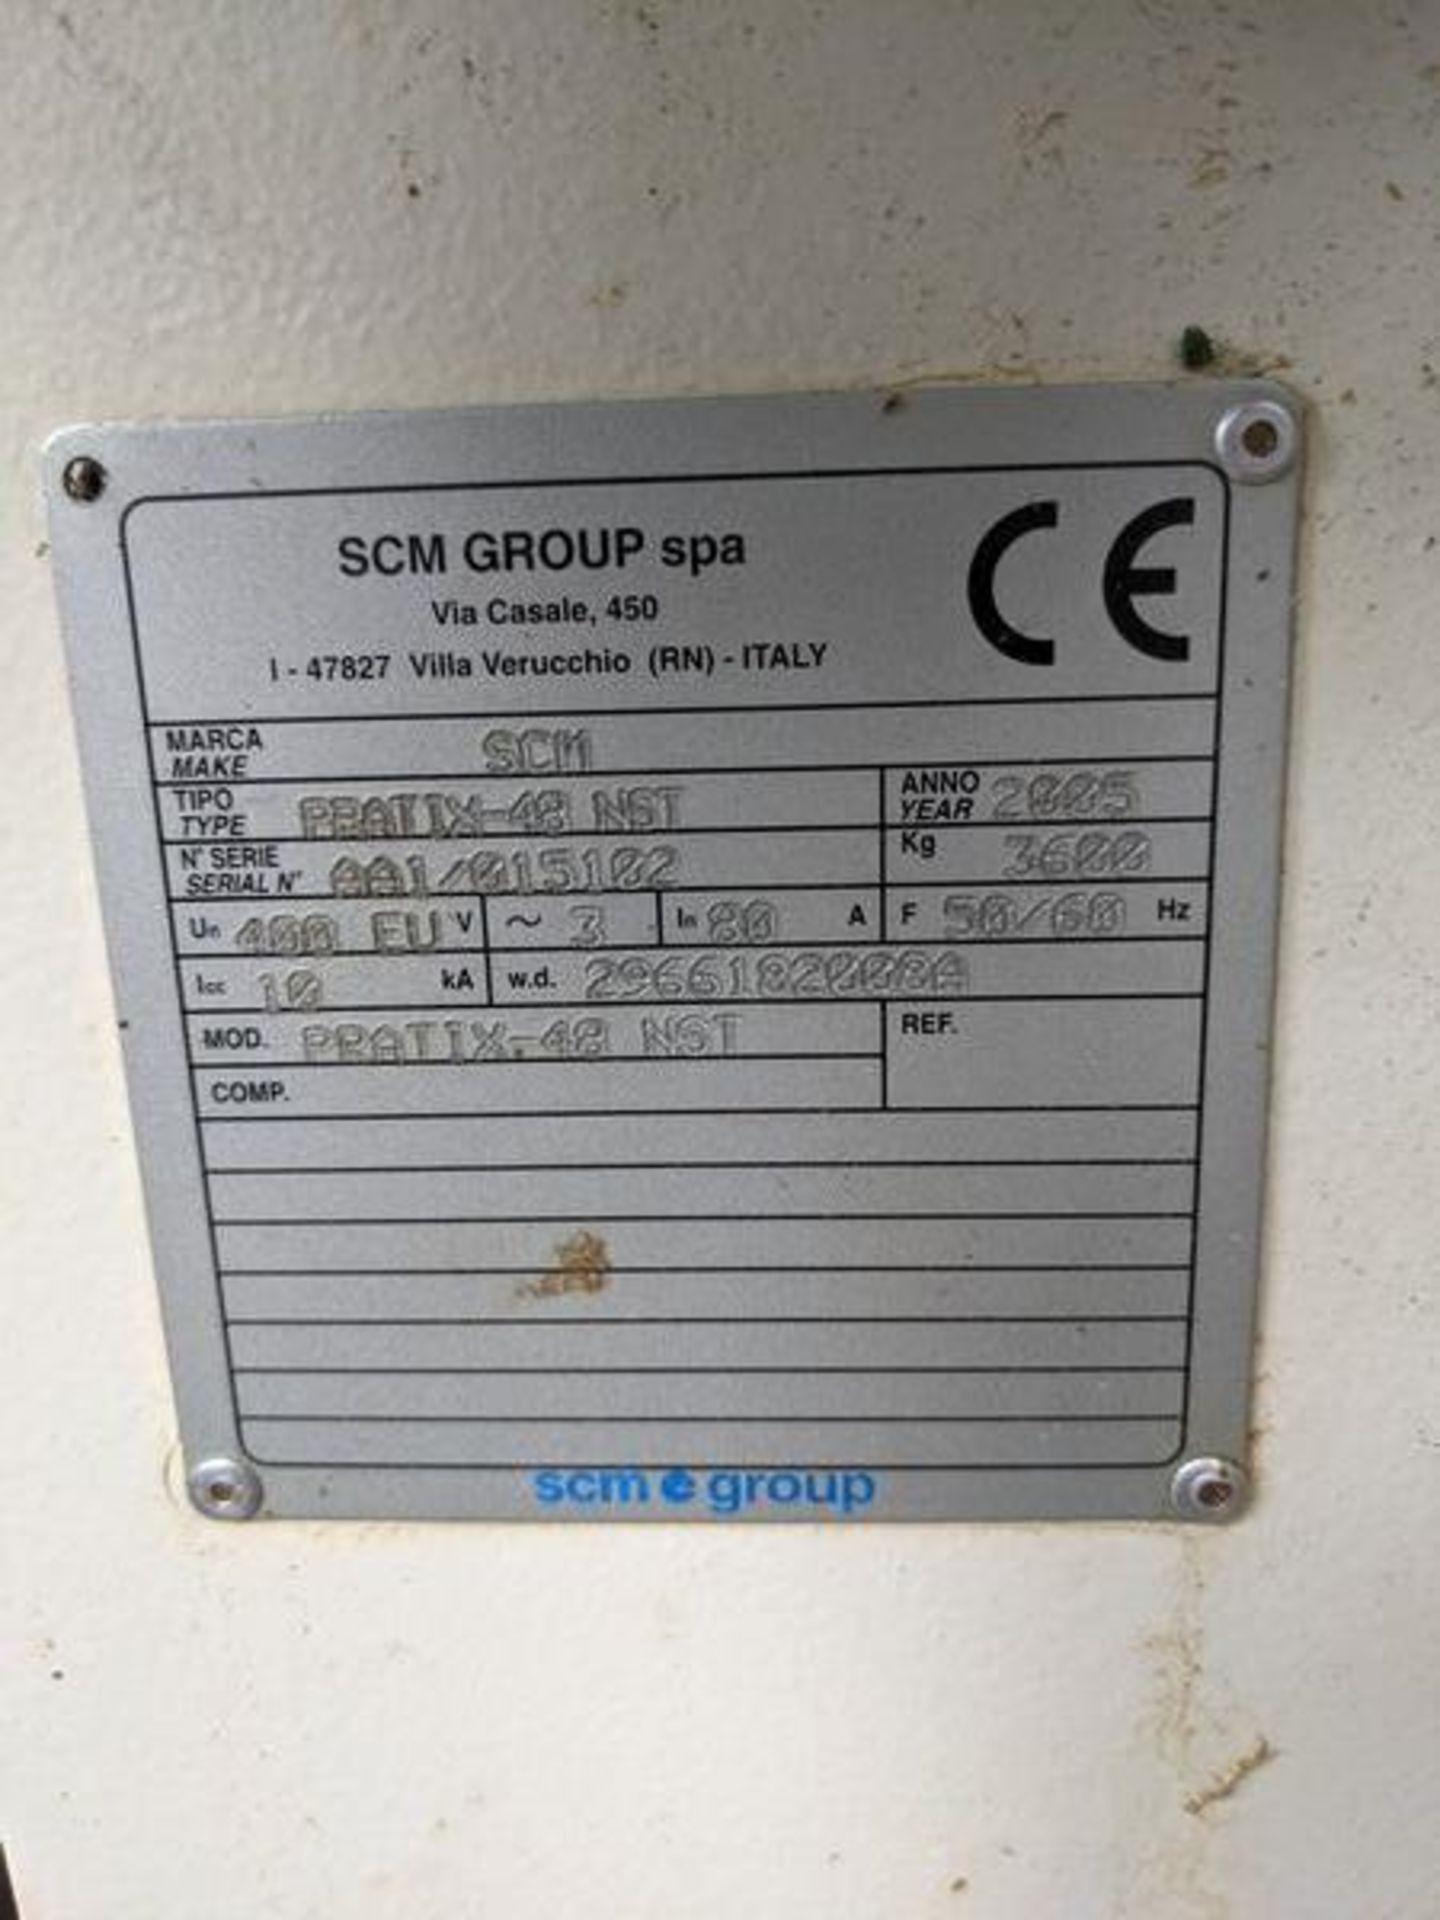 SCM PRATIX 48 NST CNC Nesting Machine with 2 Transformers and 2 Vacuum Pumps - Image 2 of 5